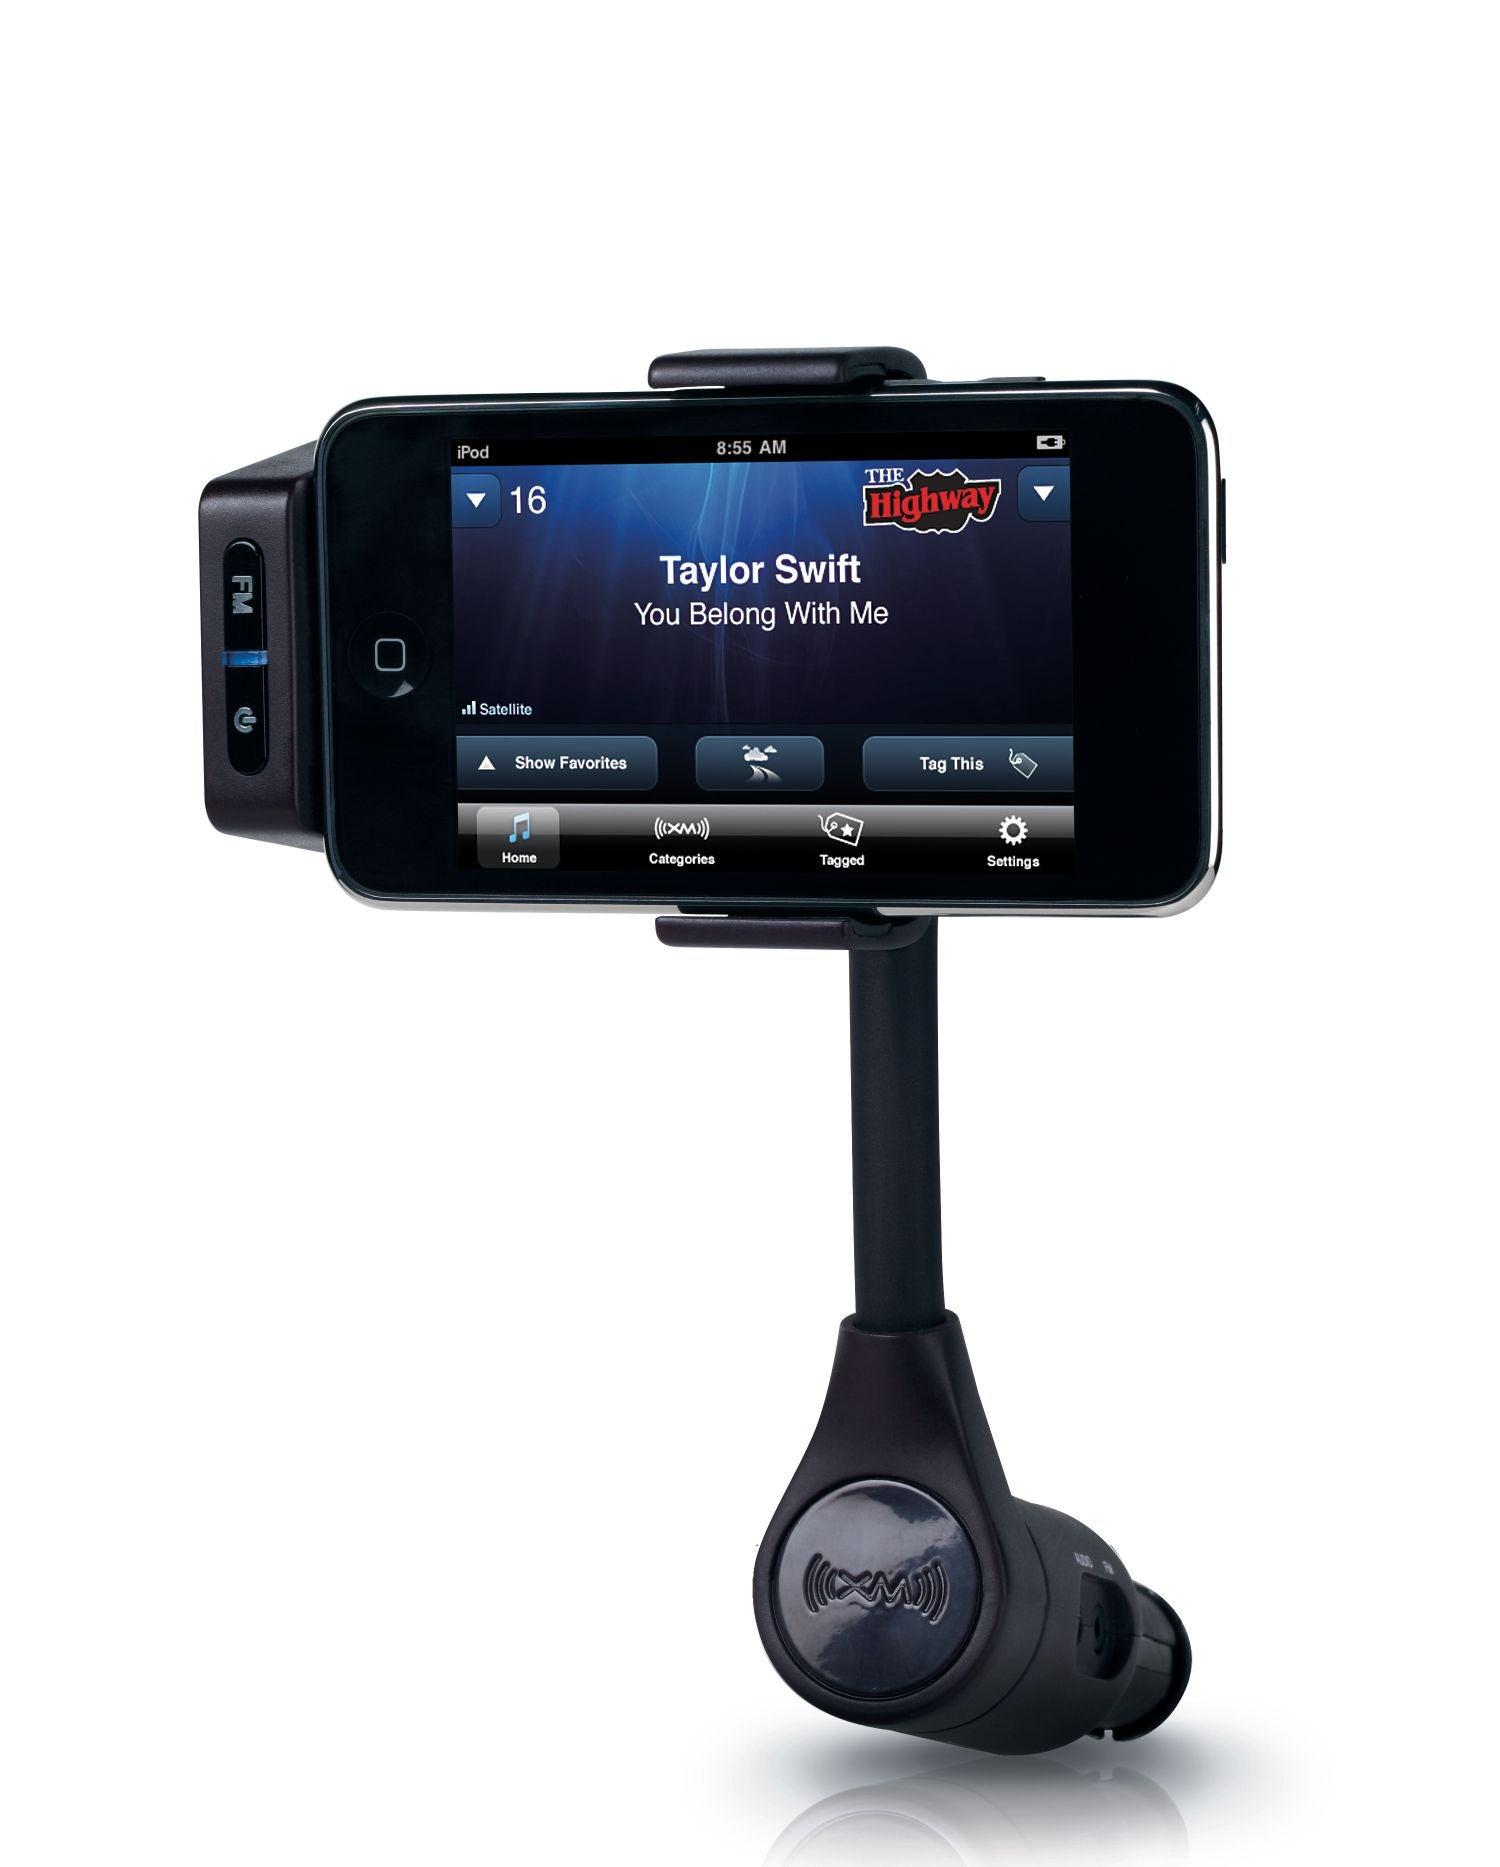 Sirius XM SkyDock Brings Full Satellite Radio Experience to iPhone